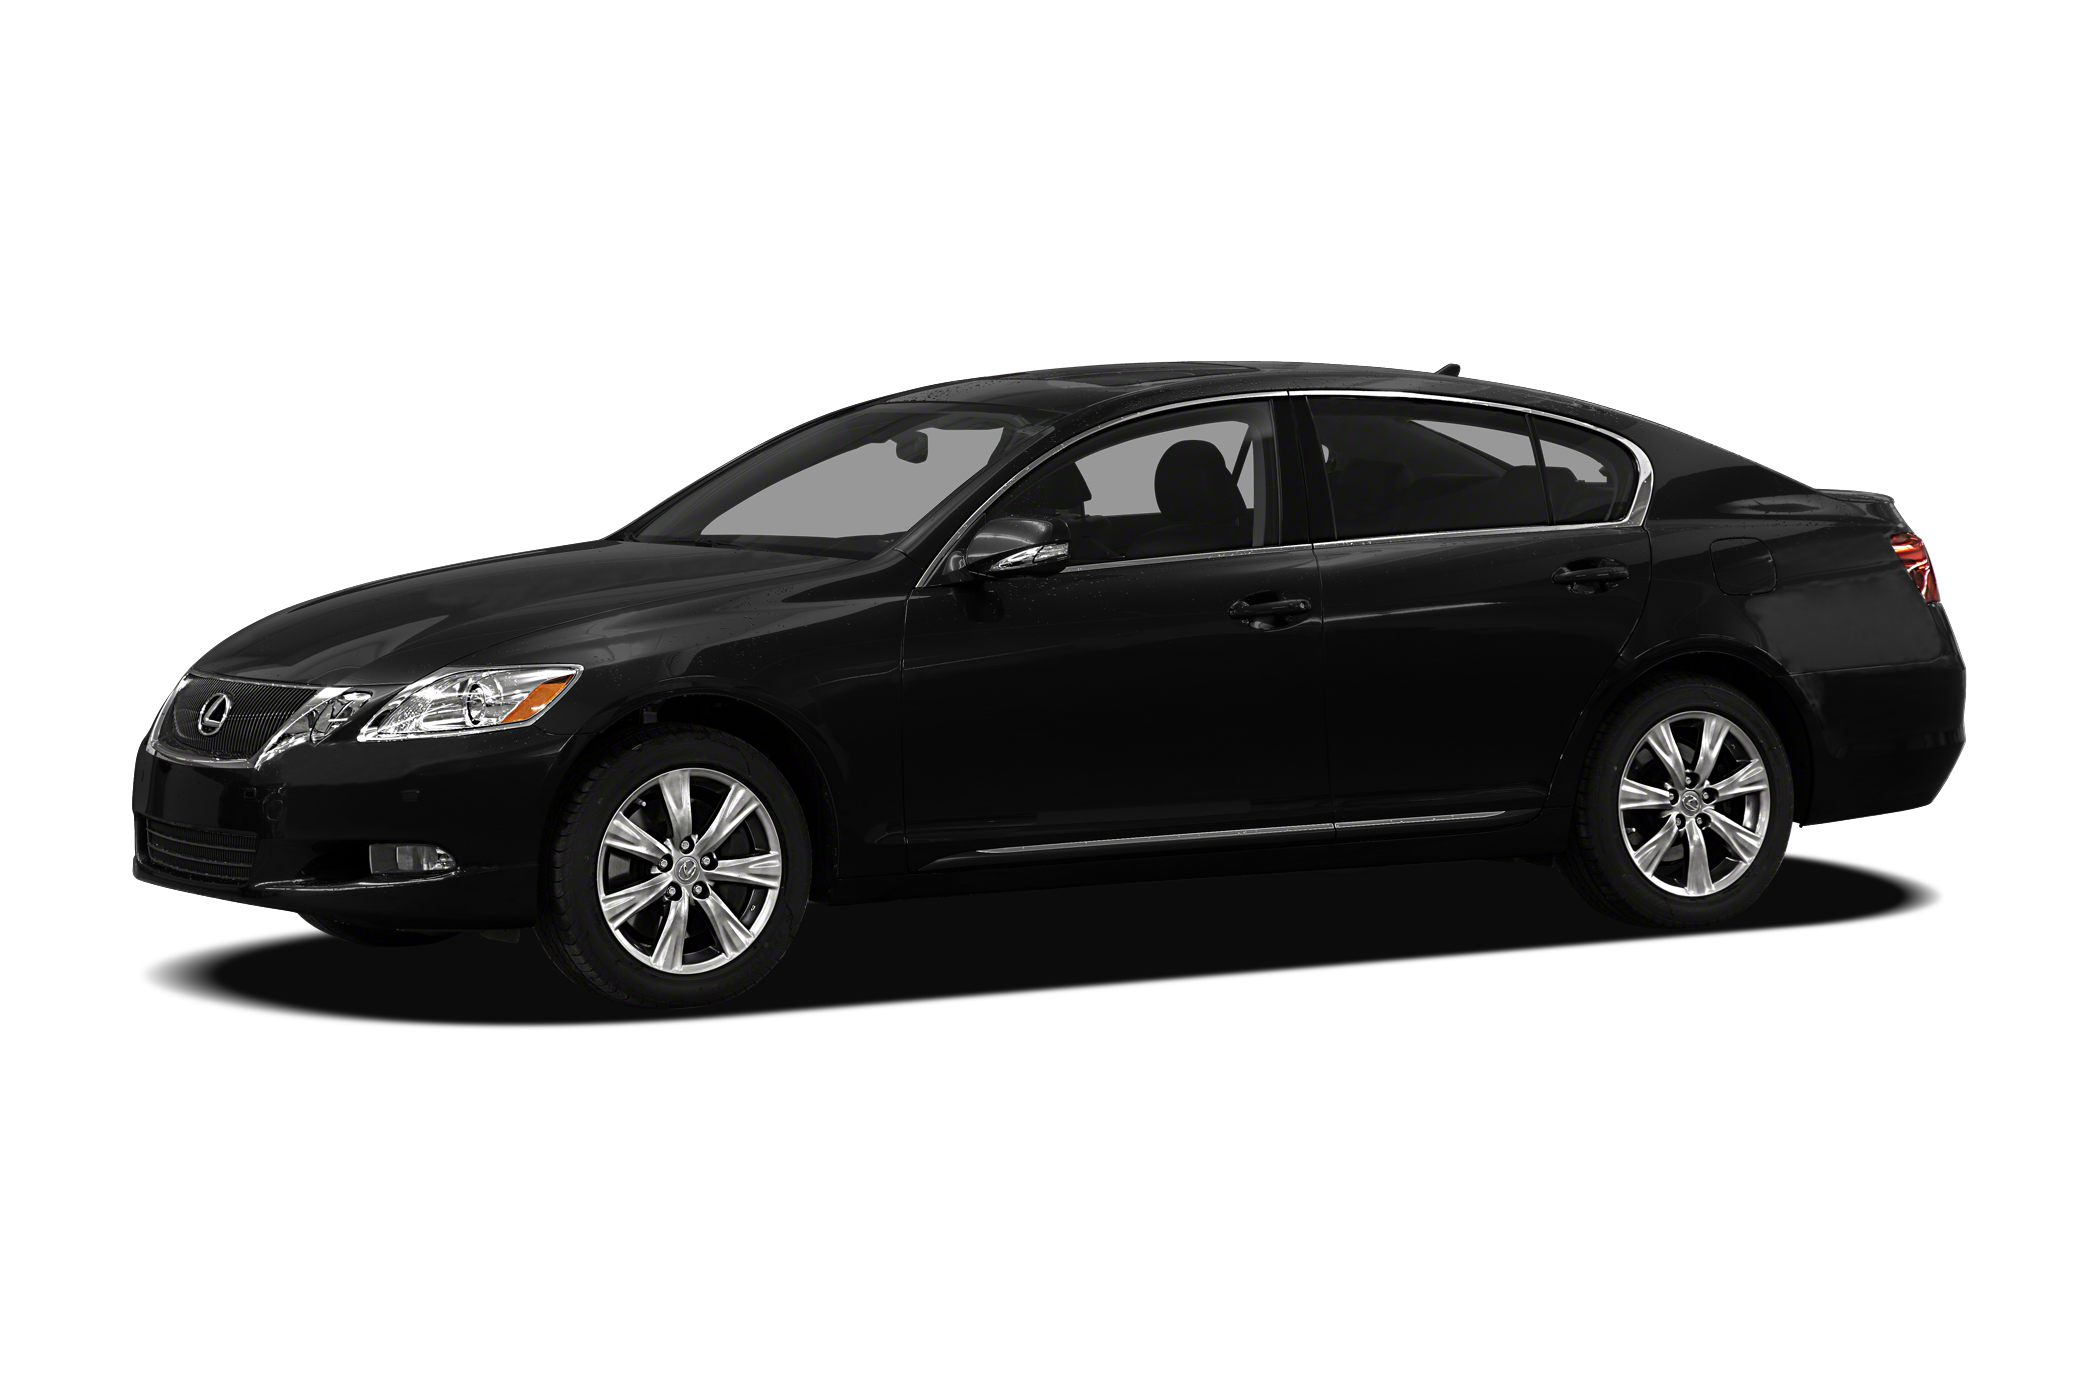 2011 Lexus GS 350 Base Sedan for sale in Dublin for $28,500 with 64,644 miles.